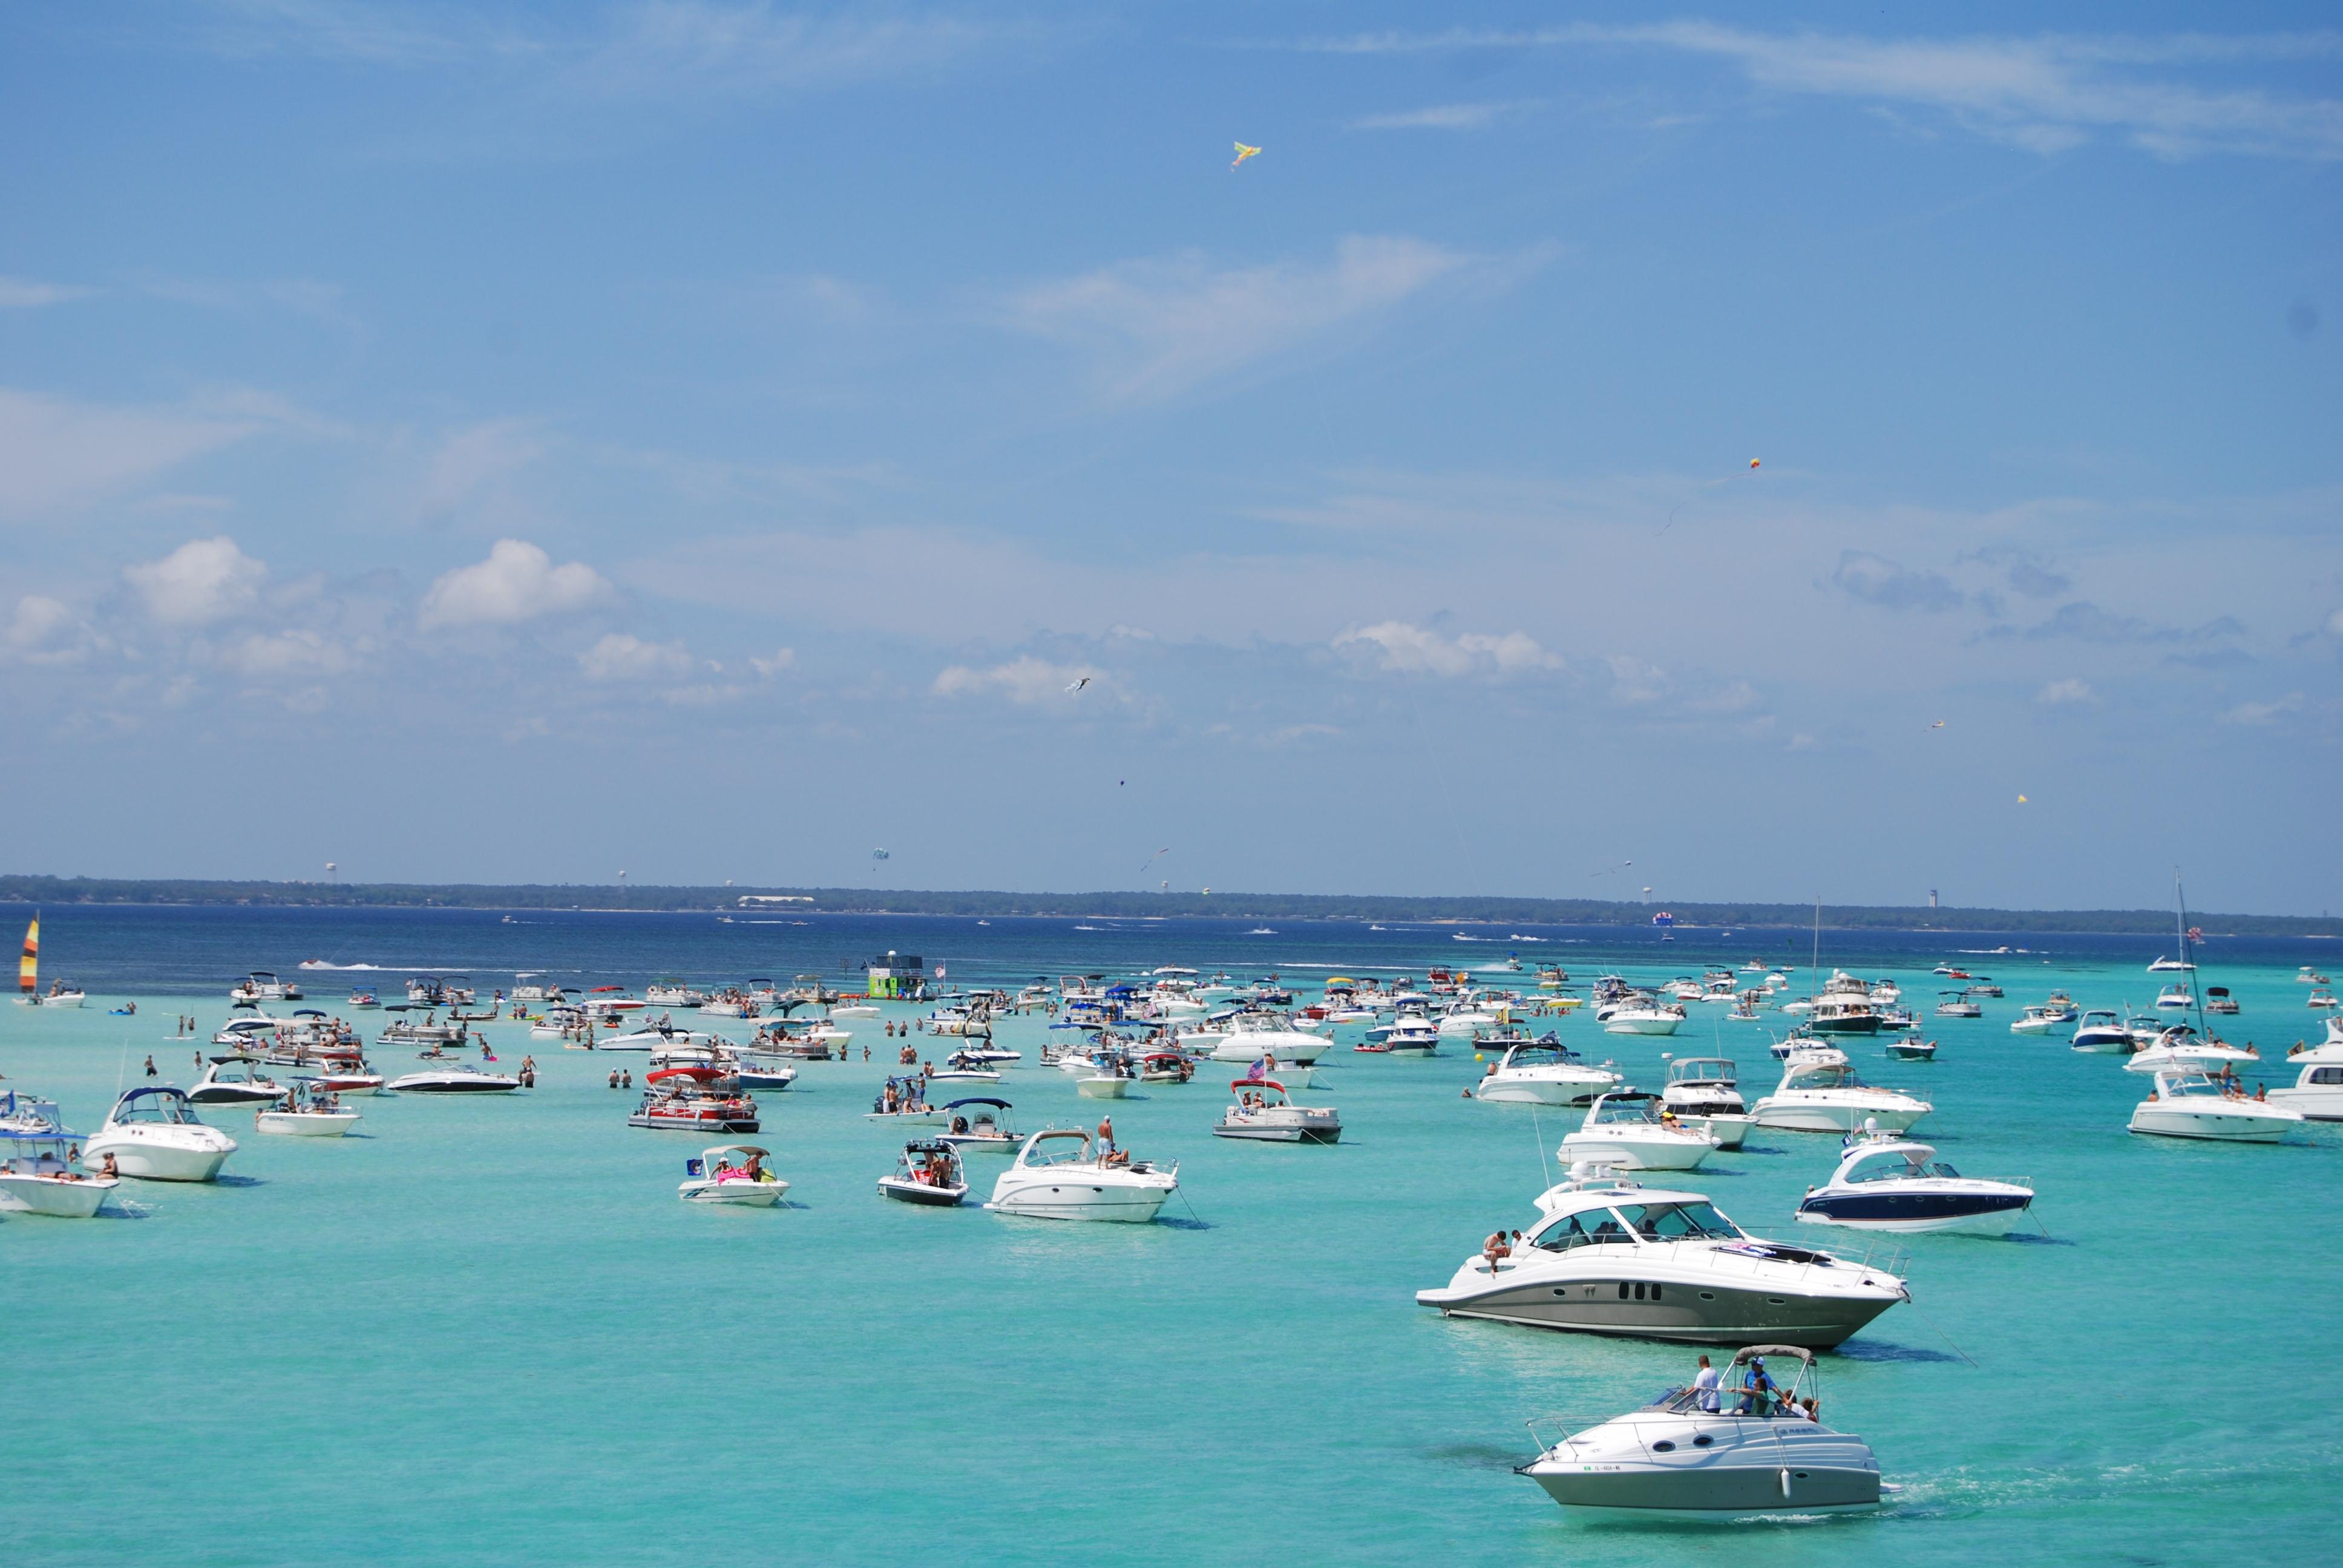 Crab Island In Destin Florida: The Complete Visitors Guide - Crab Island Destin Florida Map